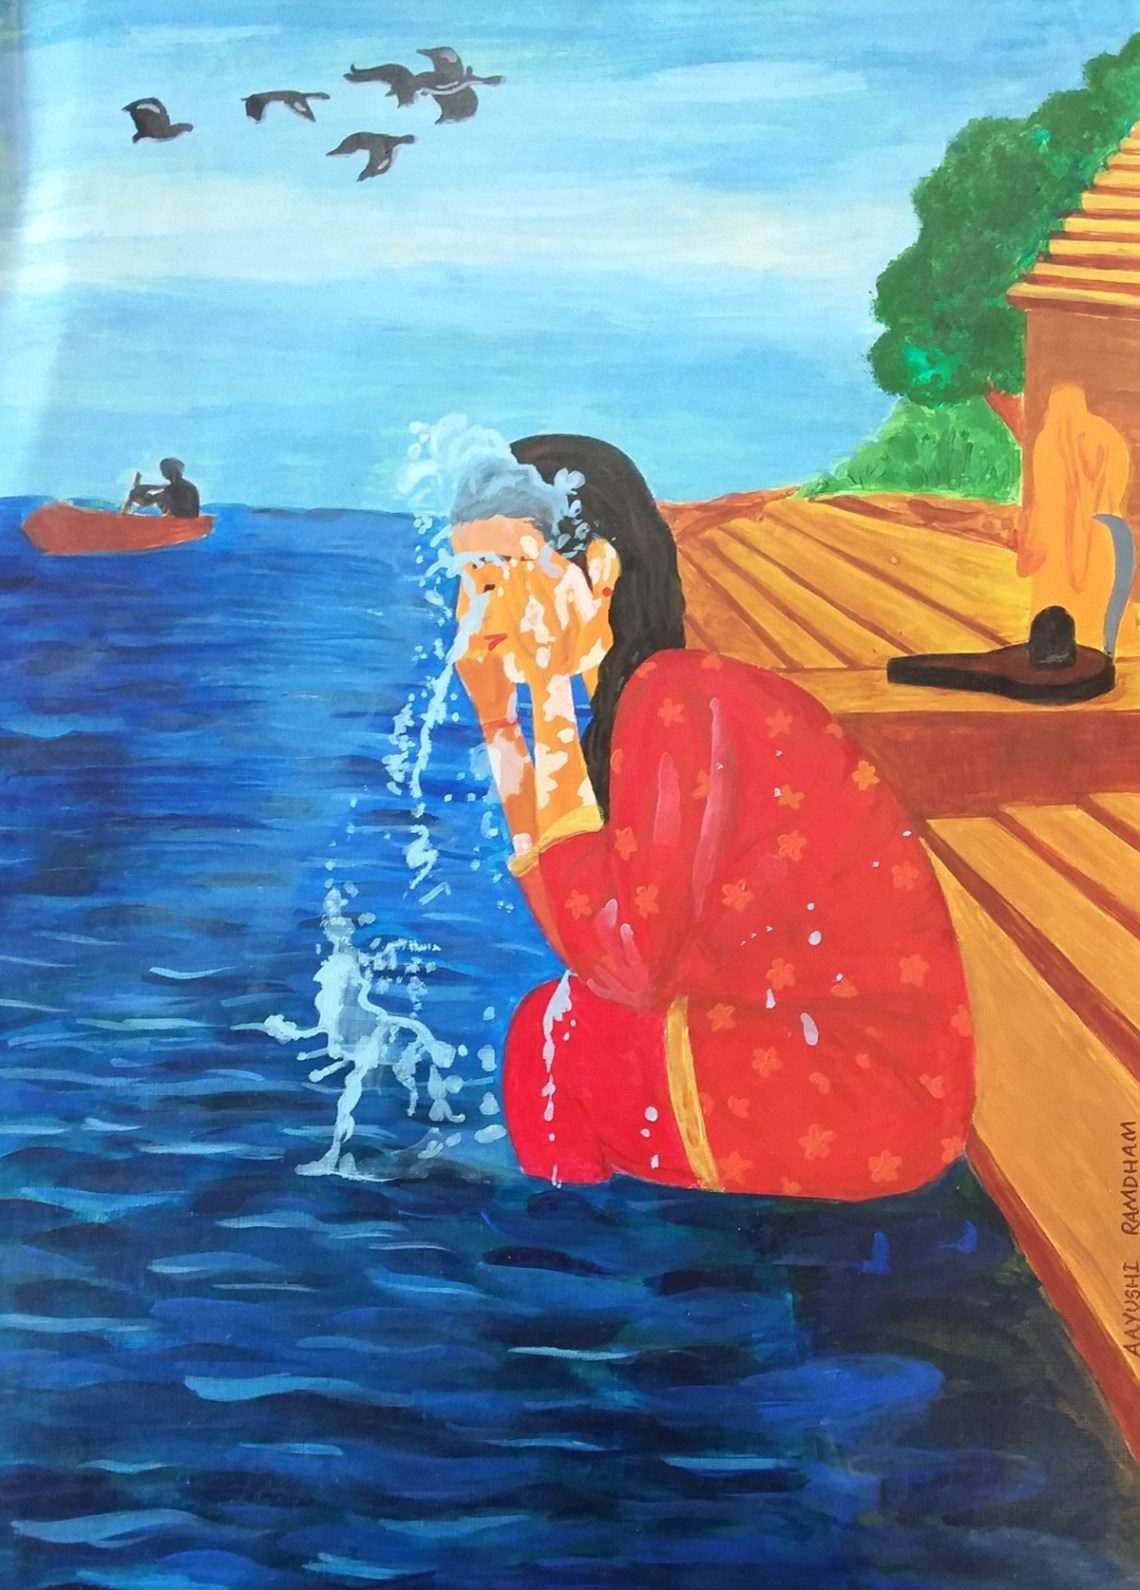 Tirtha - washing away all sins, painting by young artist Aayushi Bhagwat Ramdham from Khula Aasmaan art contest.